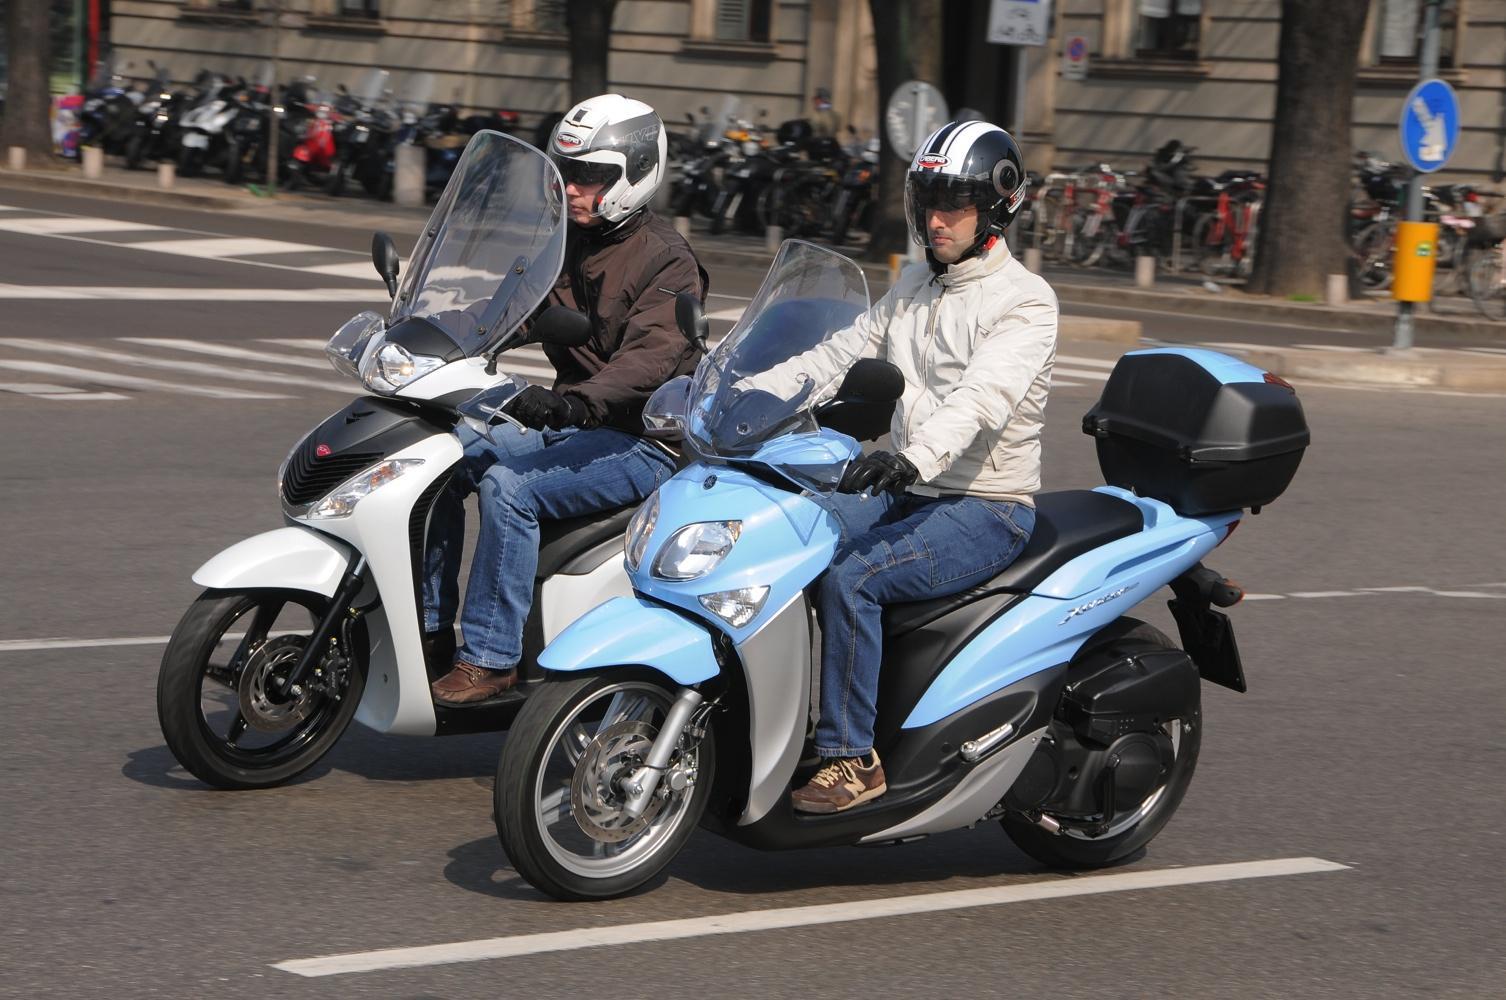 Foto Prova Honda SH 125 e Yamaha Xenter 125, scooter da